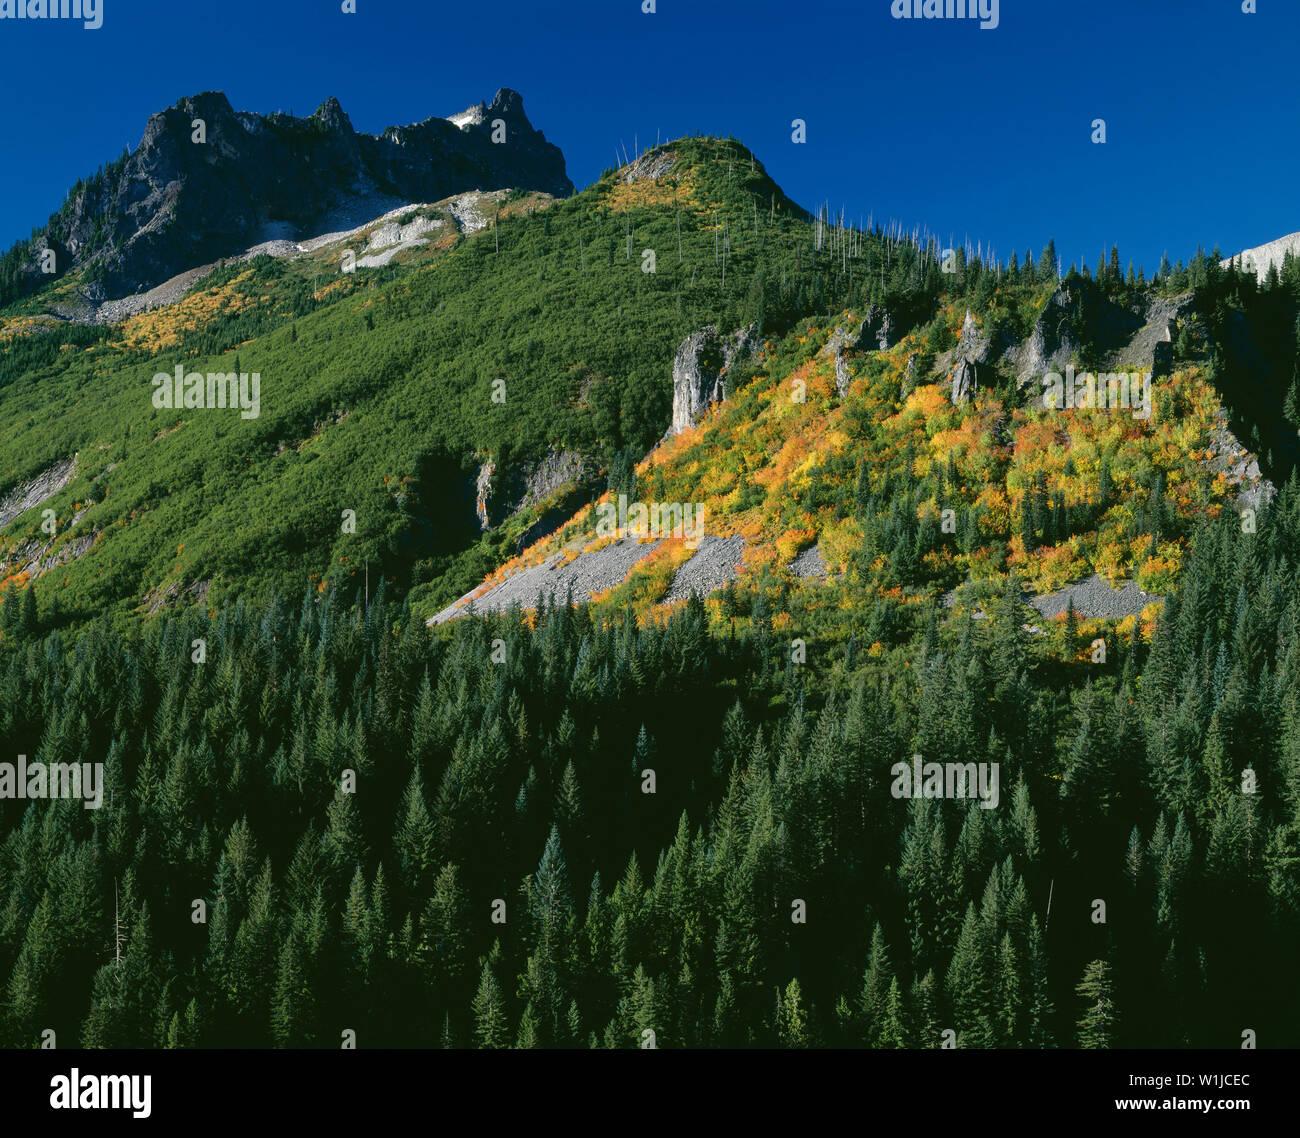 USA, Washington, Mt. Rainier National Park, Stevens Peak, part of the Tatoosh Range, above evergreen forest and fall-colored vine maple. - Stock Image